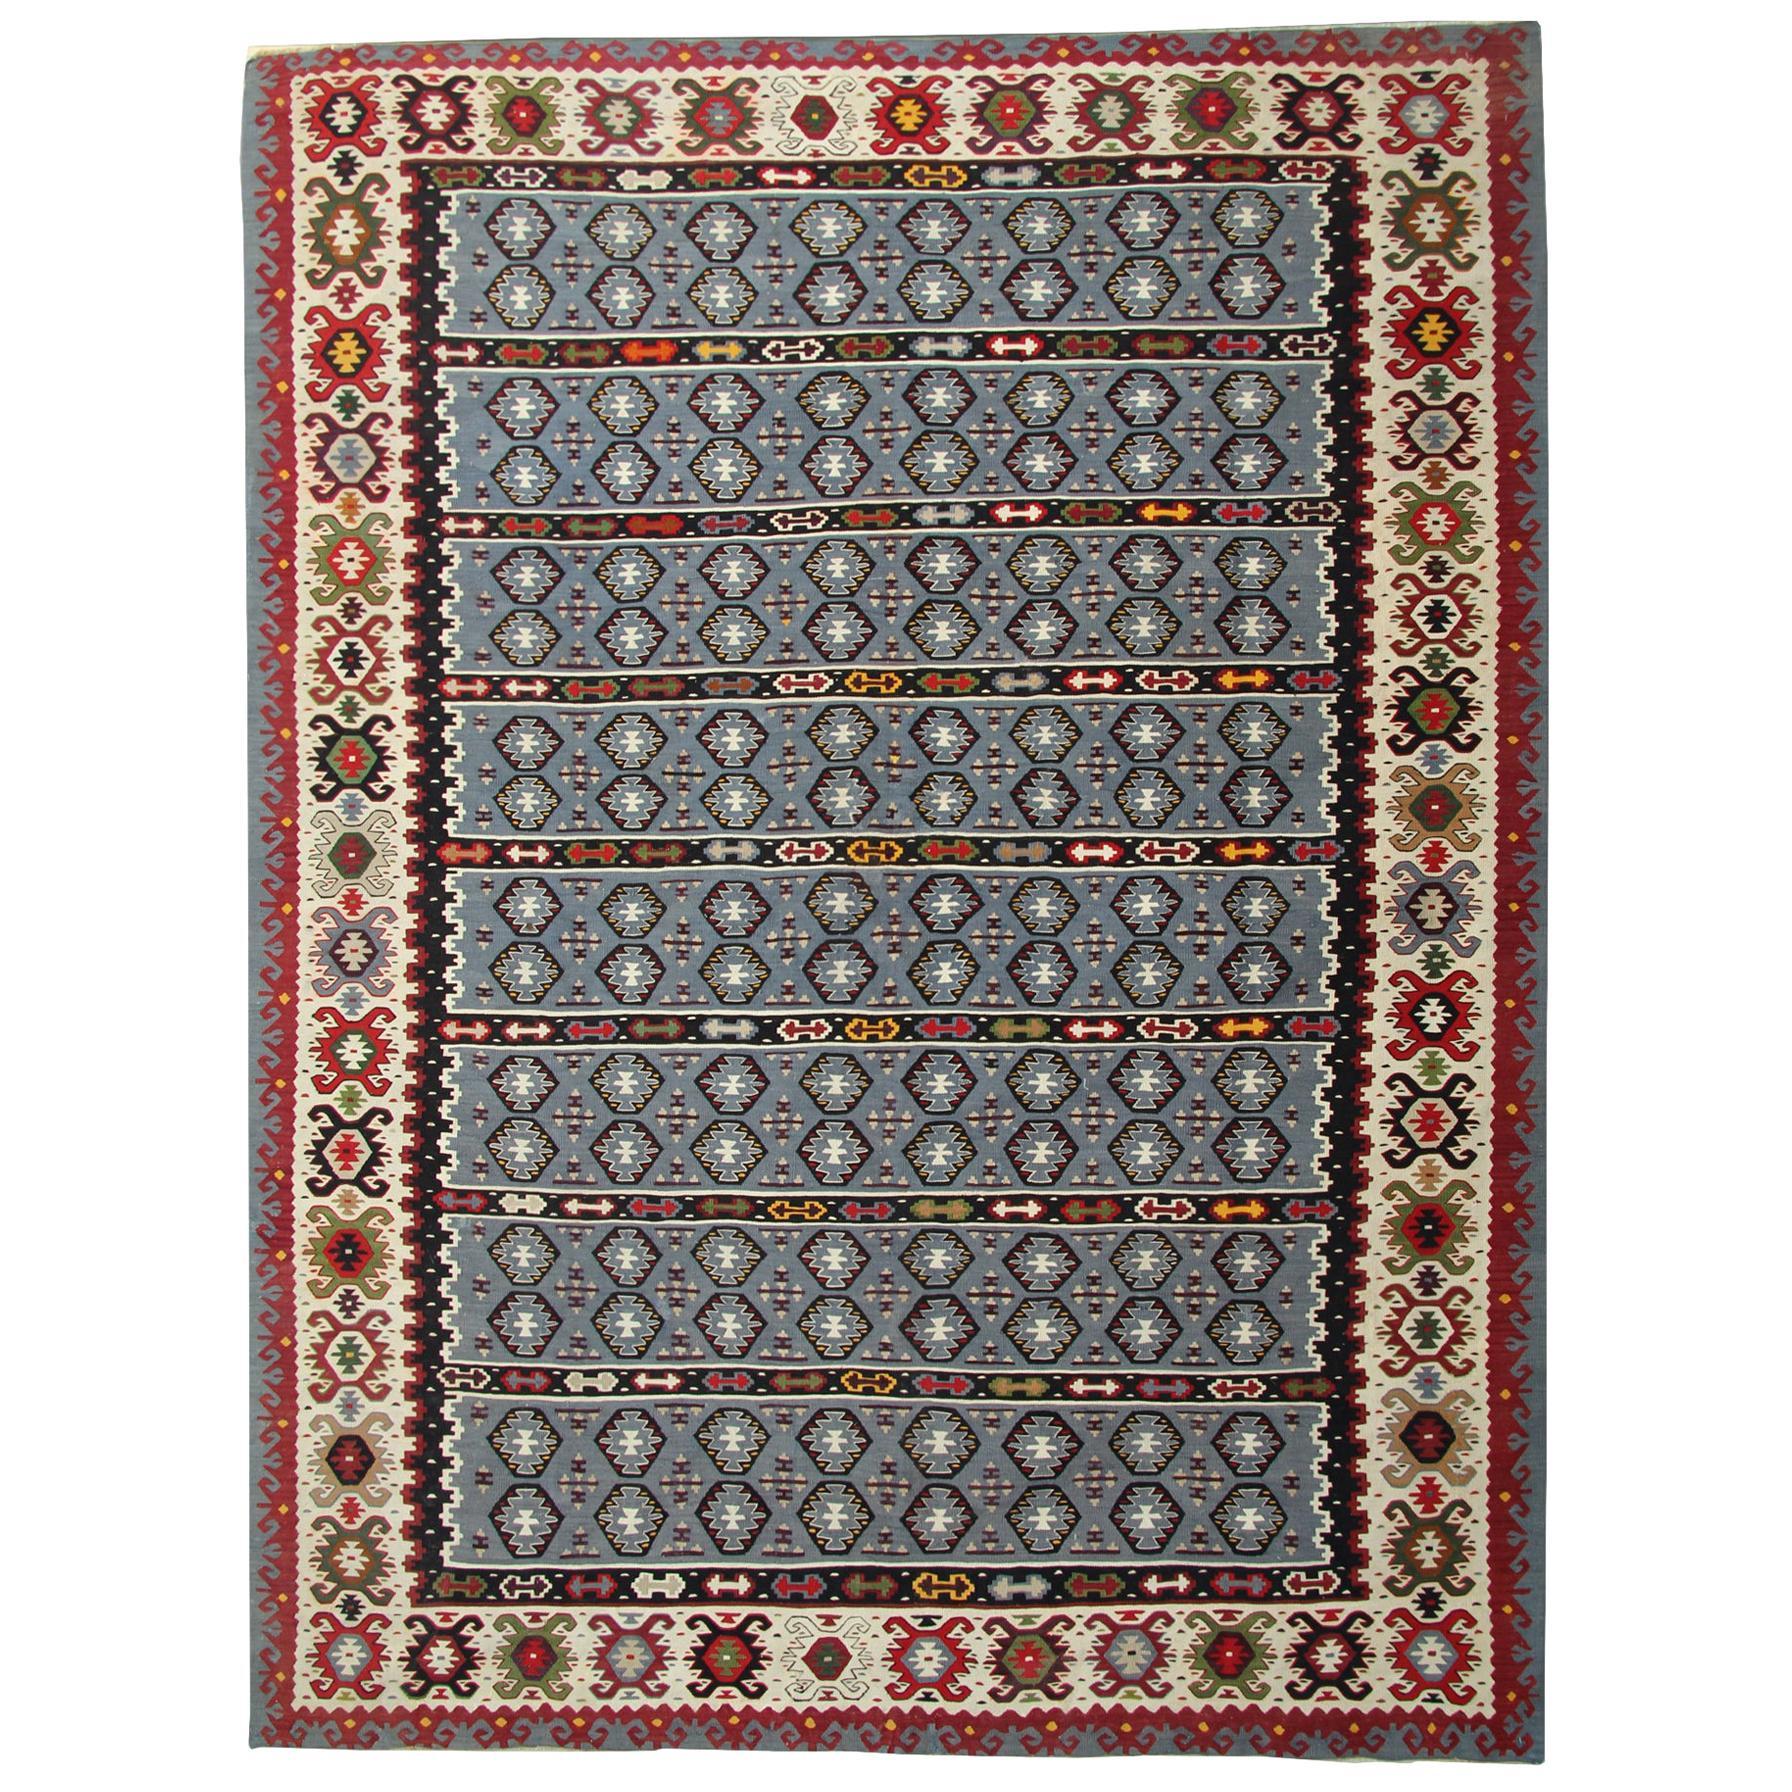 Antique Rug Serbian, Handmade Carpet Vintage Kilim Rug, Geometric Oriental Rug